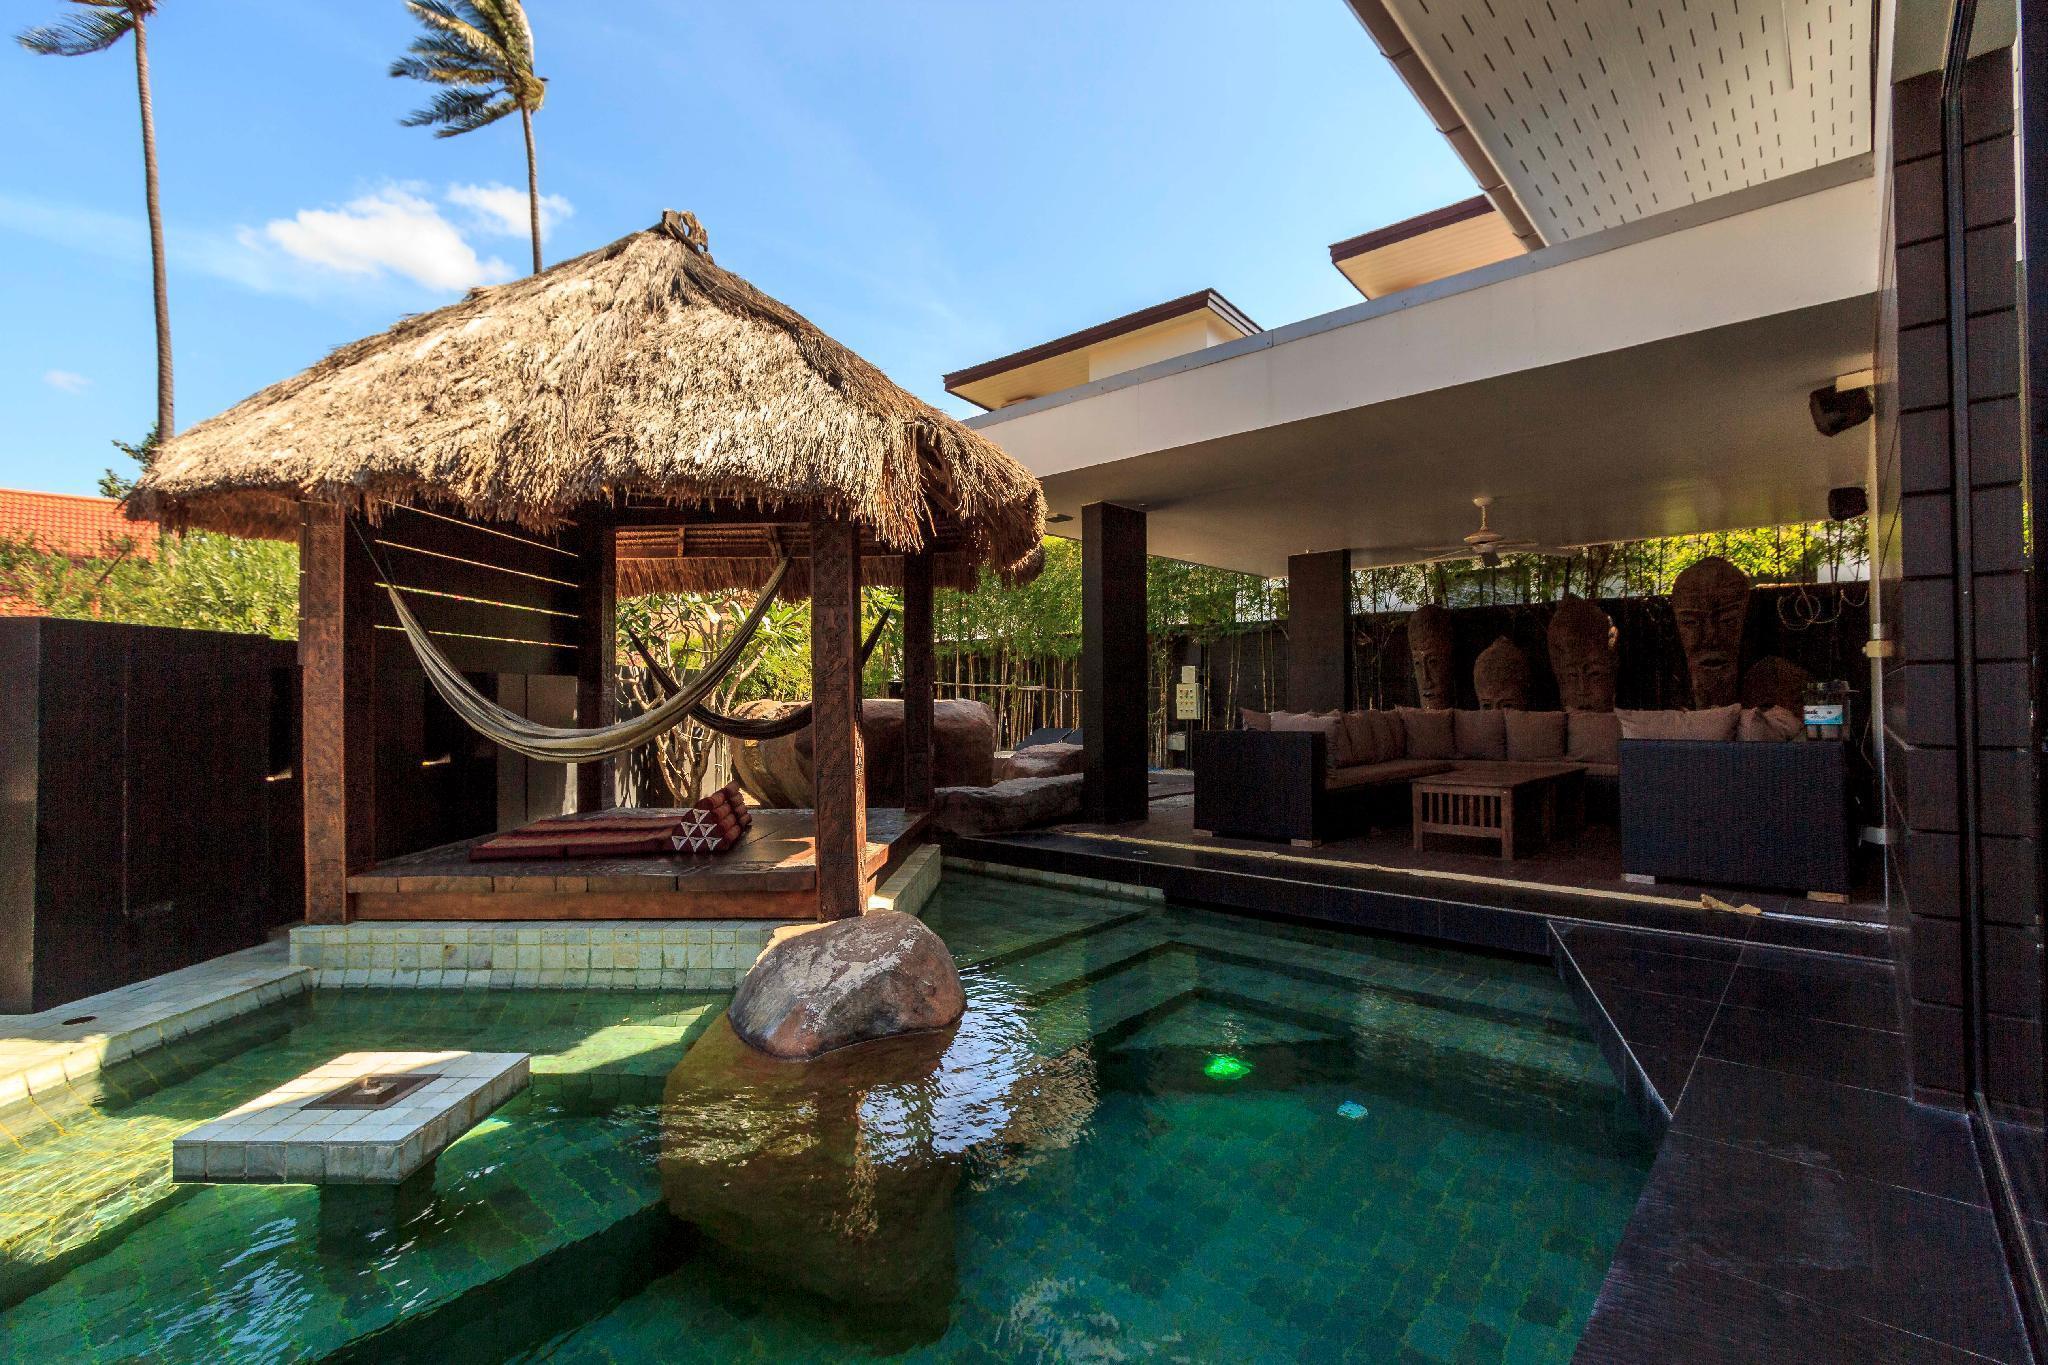 Modern pool villa - Malee Beach Villa F5 วิลลา 3 ห้องนอน 2 ห้องน้ำส่วนตัว ขนาด 190 ตร.ม. – หาดพระแอะ